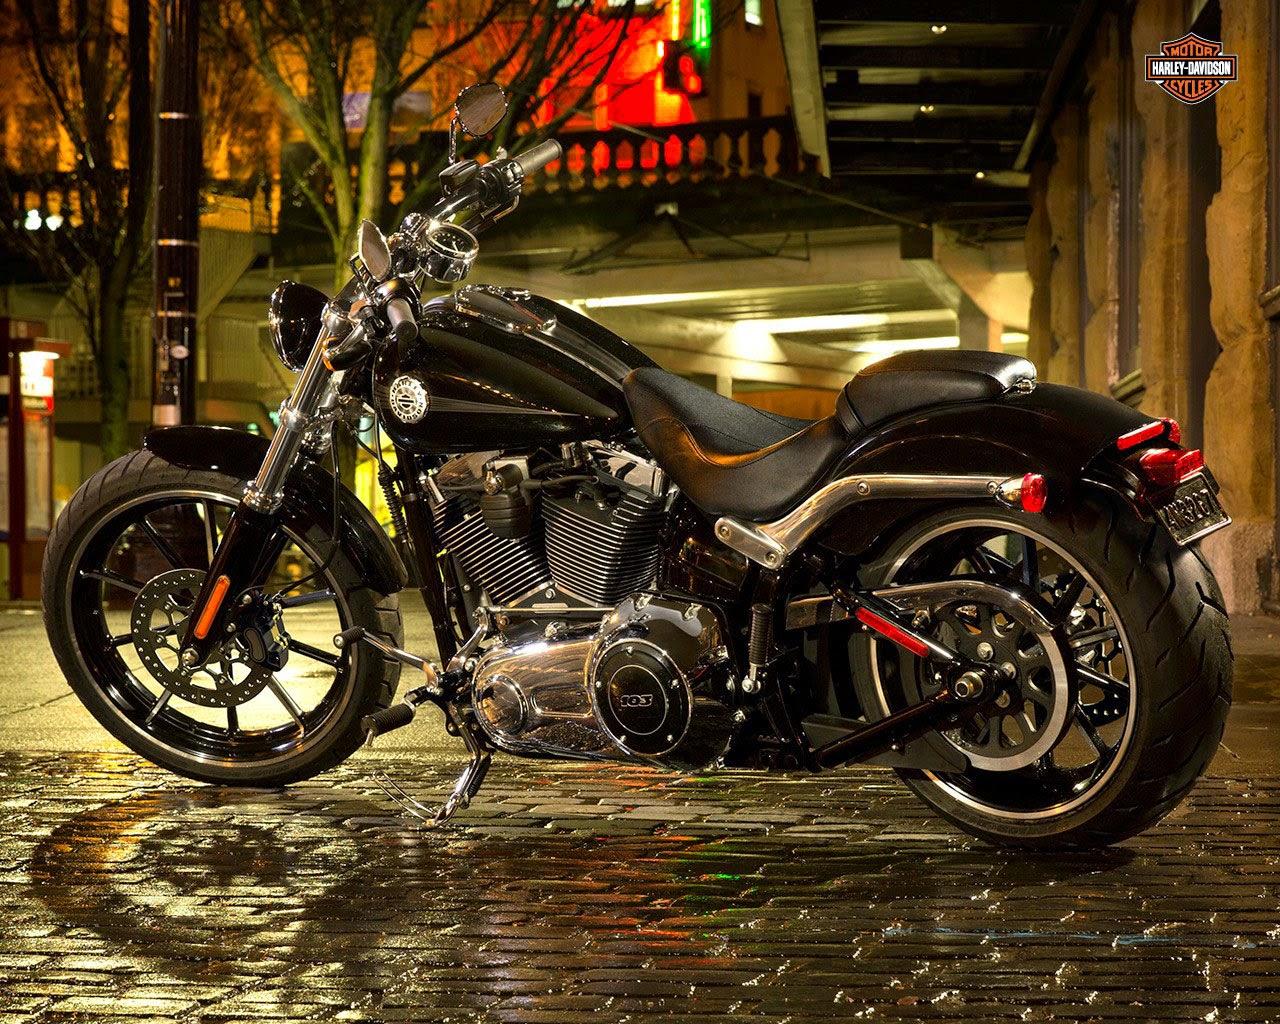 harley davidson softail owner s manual 2015 Harley-Davidson Softail Deluxe Softail Deluxe Bagger Conversion